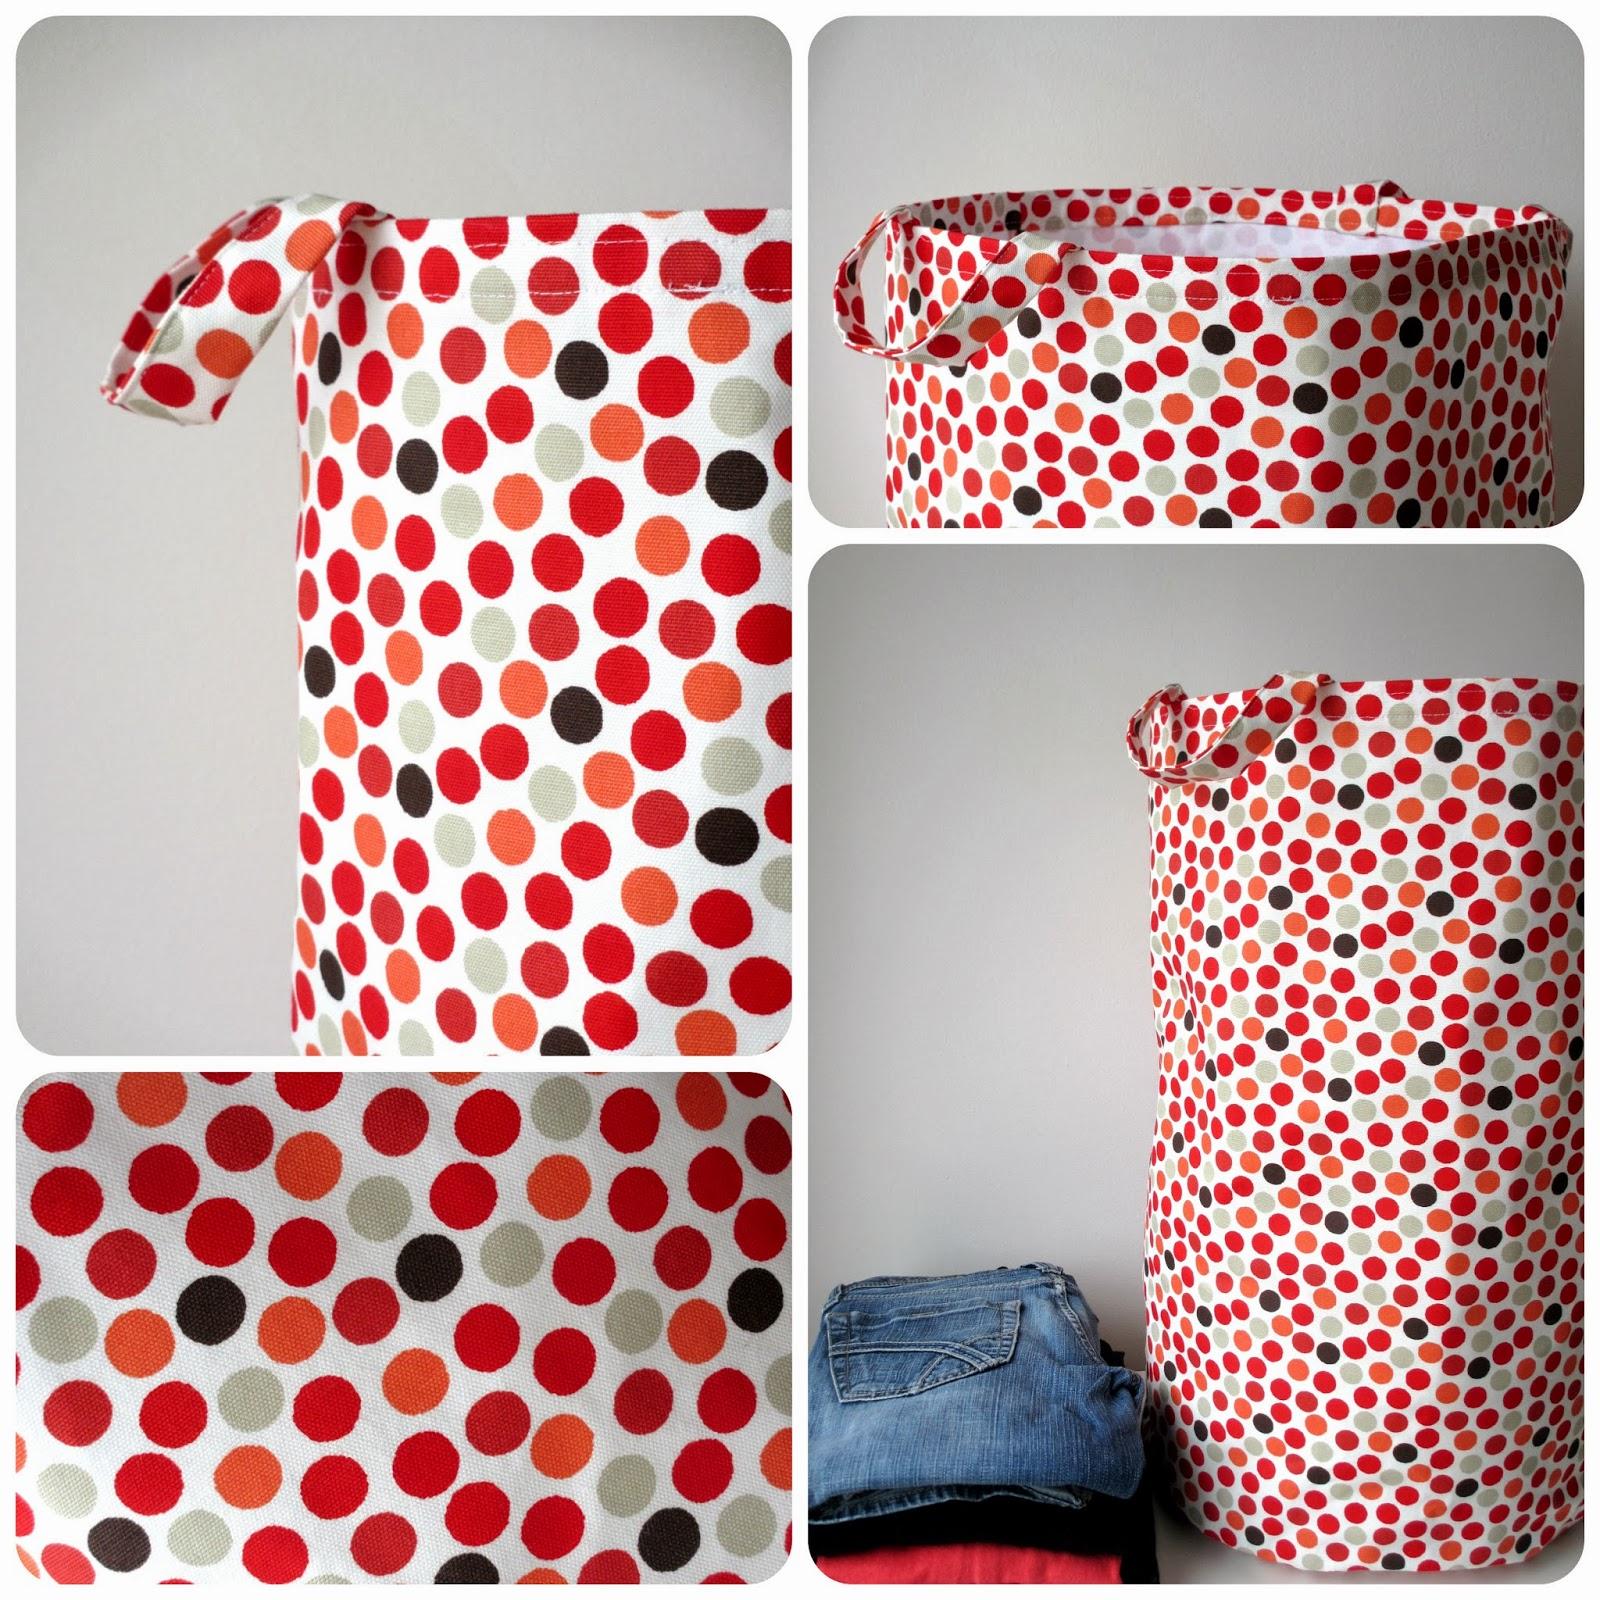 tuto couture sac a linge. Black Bedroom Furniture Sets. Home Design Ideas